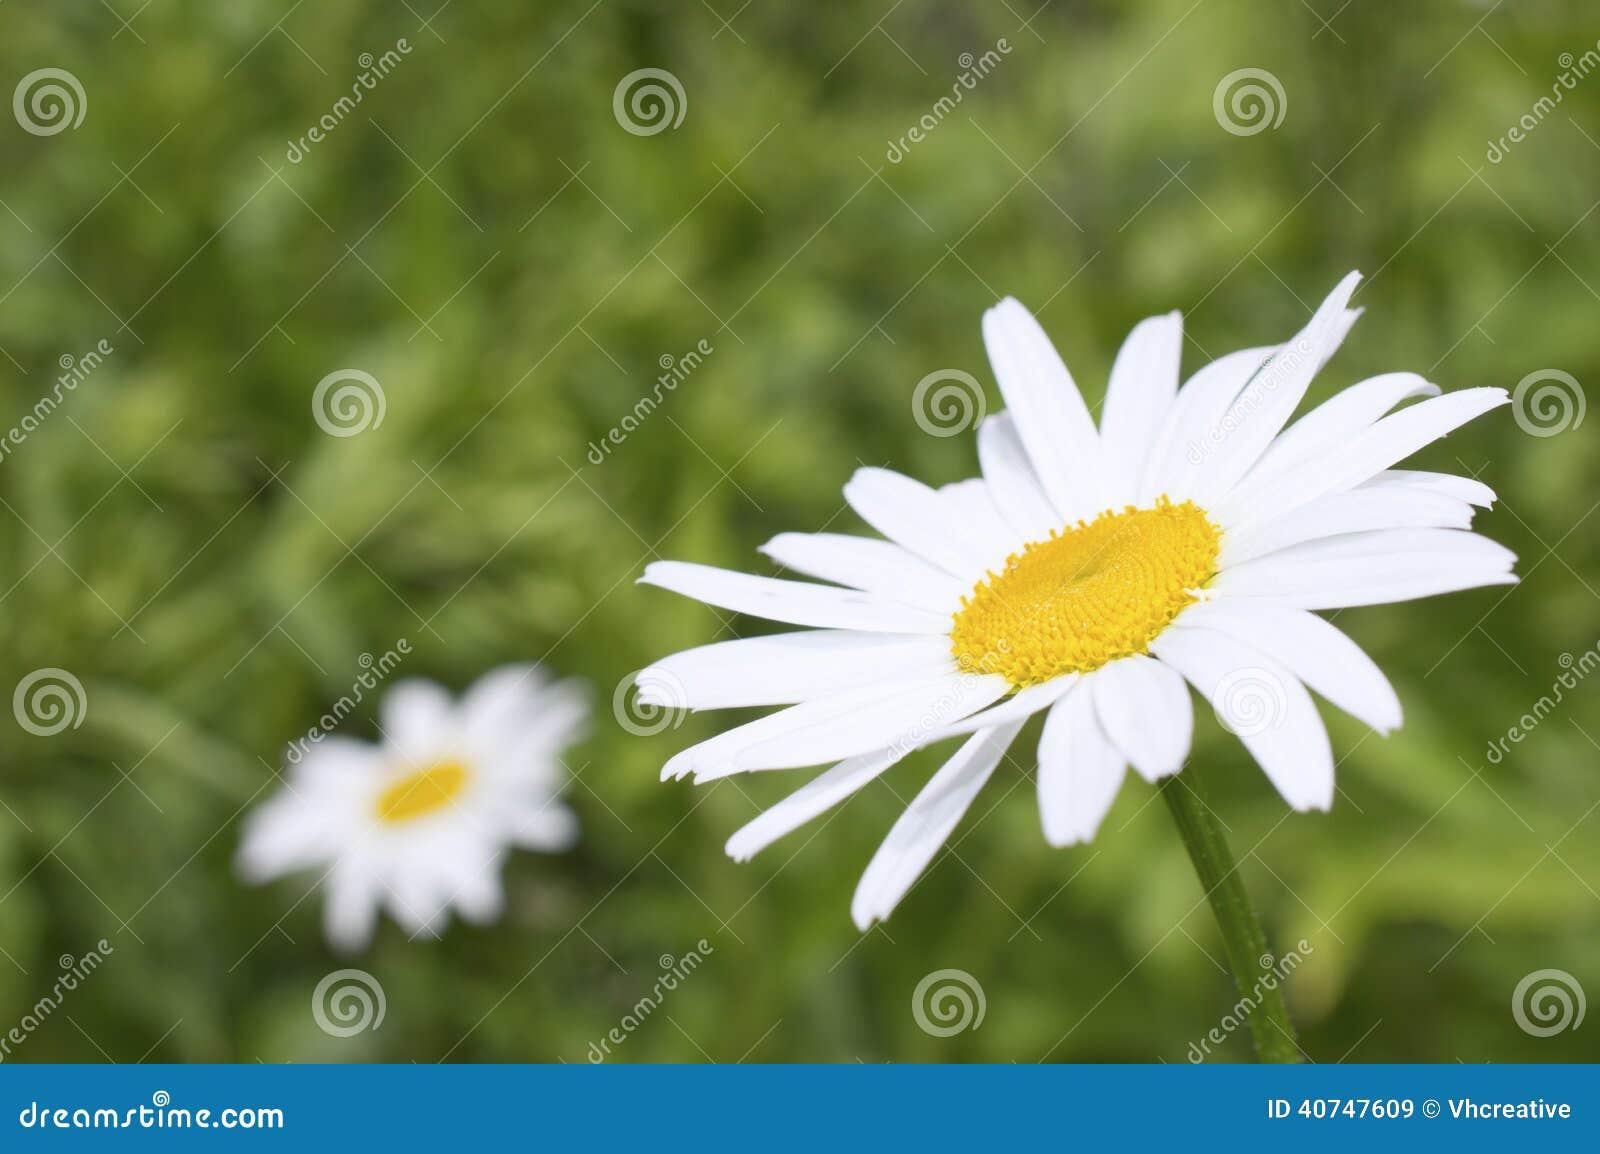 White Daisy Like Chamomile Flower Stock Image Image Of Floral